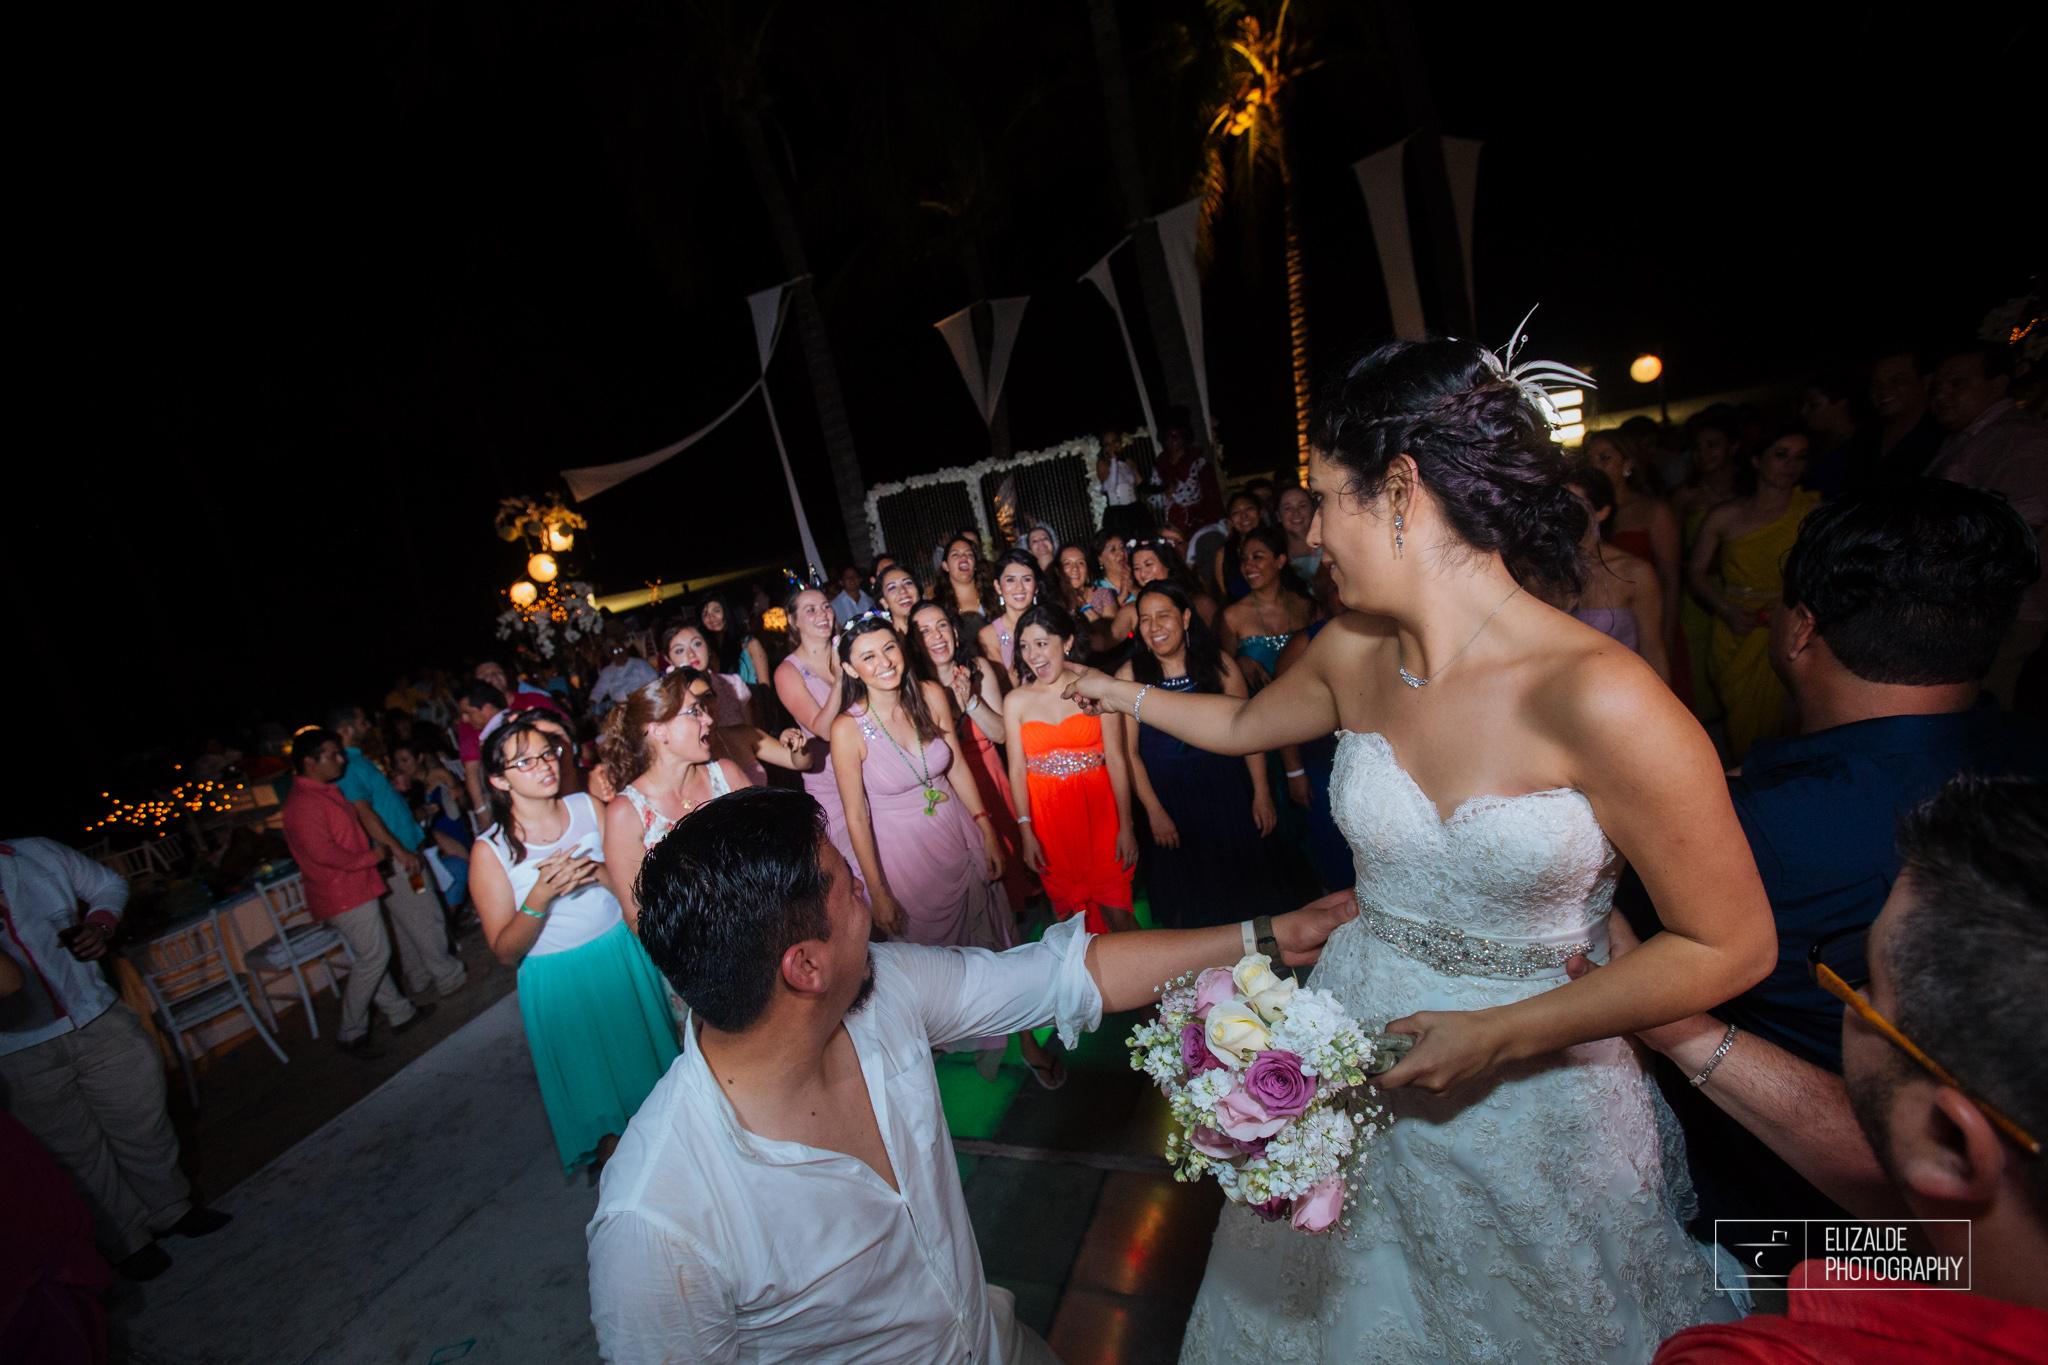 Pay and Ferran_Acapulco_Destination Wedding_Elizalde Photography-177.jpg